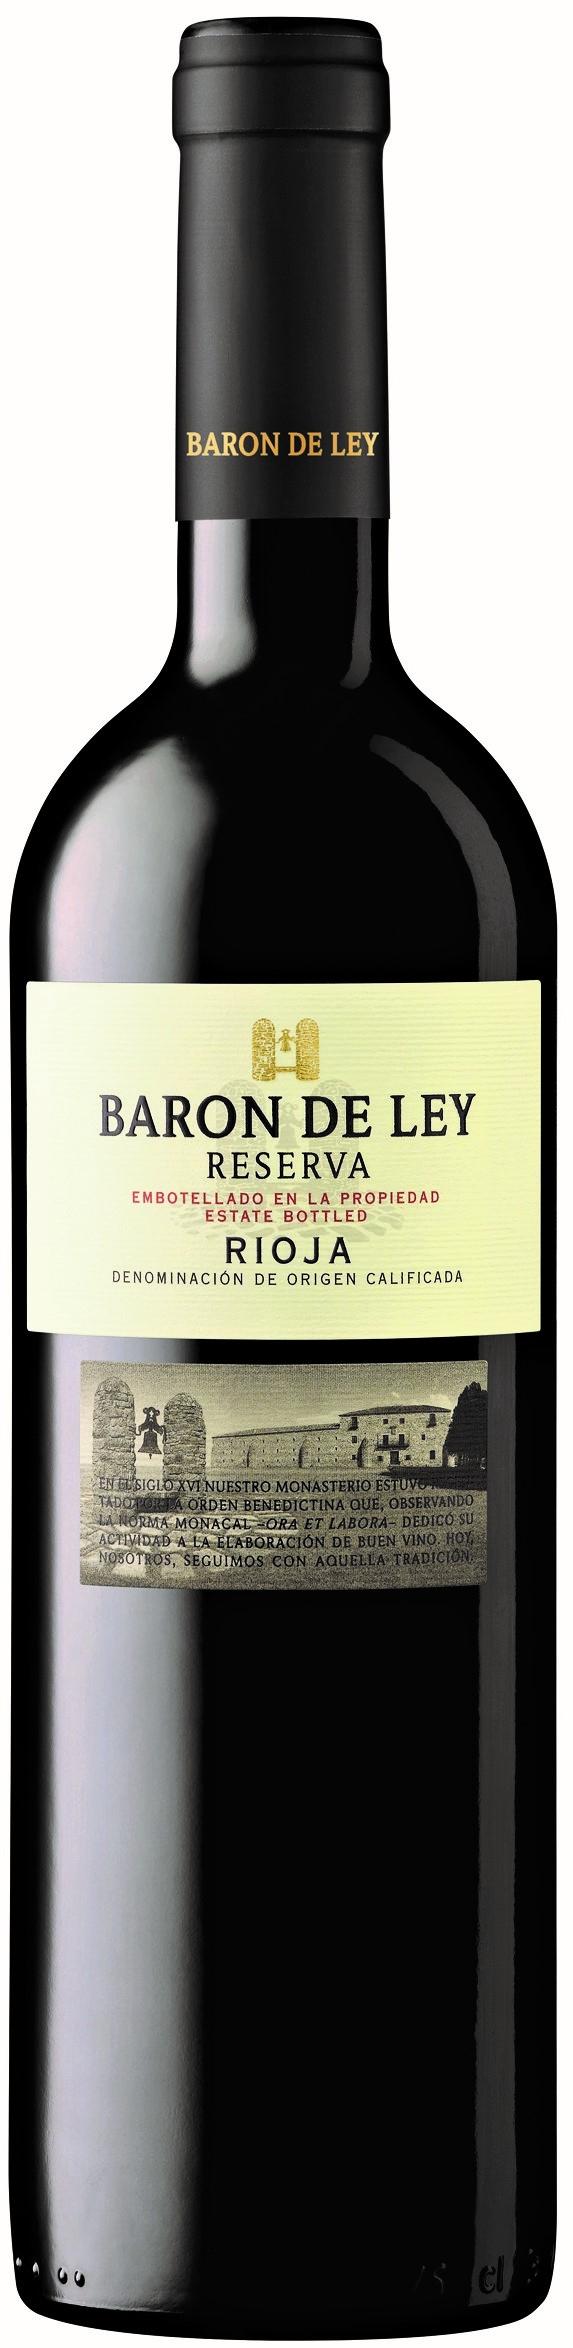 Caudalia wine Box diciembre 2018 tinto reserva España